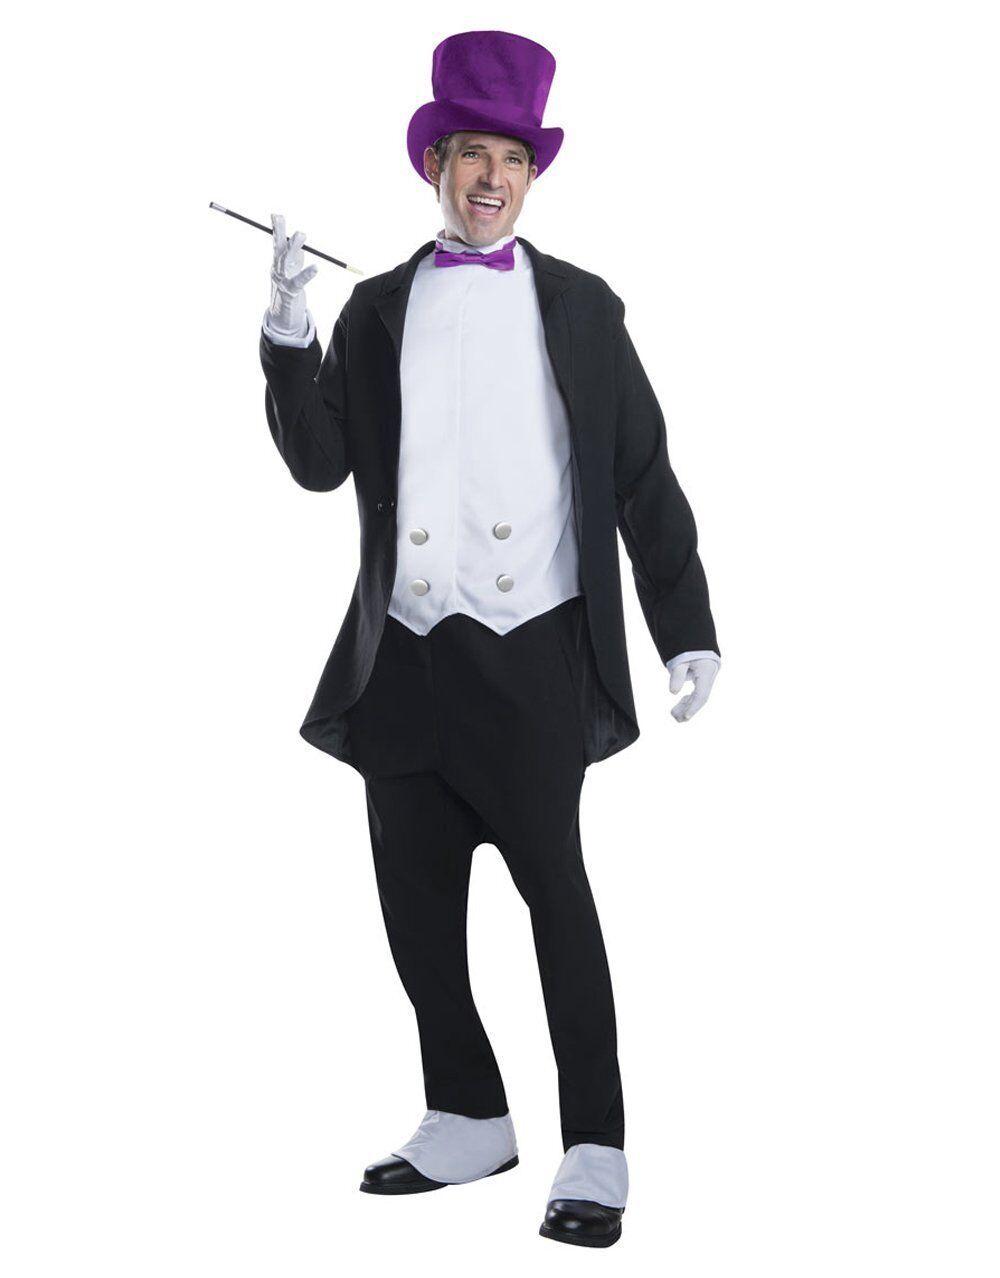 Penguin grand heritage costume, show, 60s tv show, costume, std, tour de poitrine 44